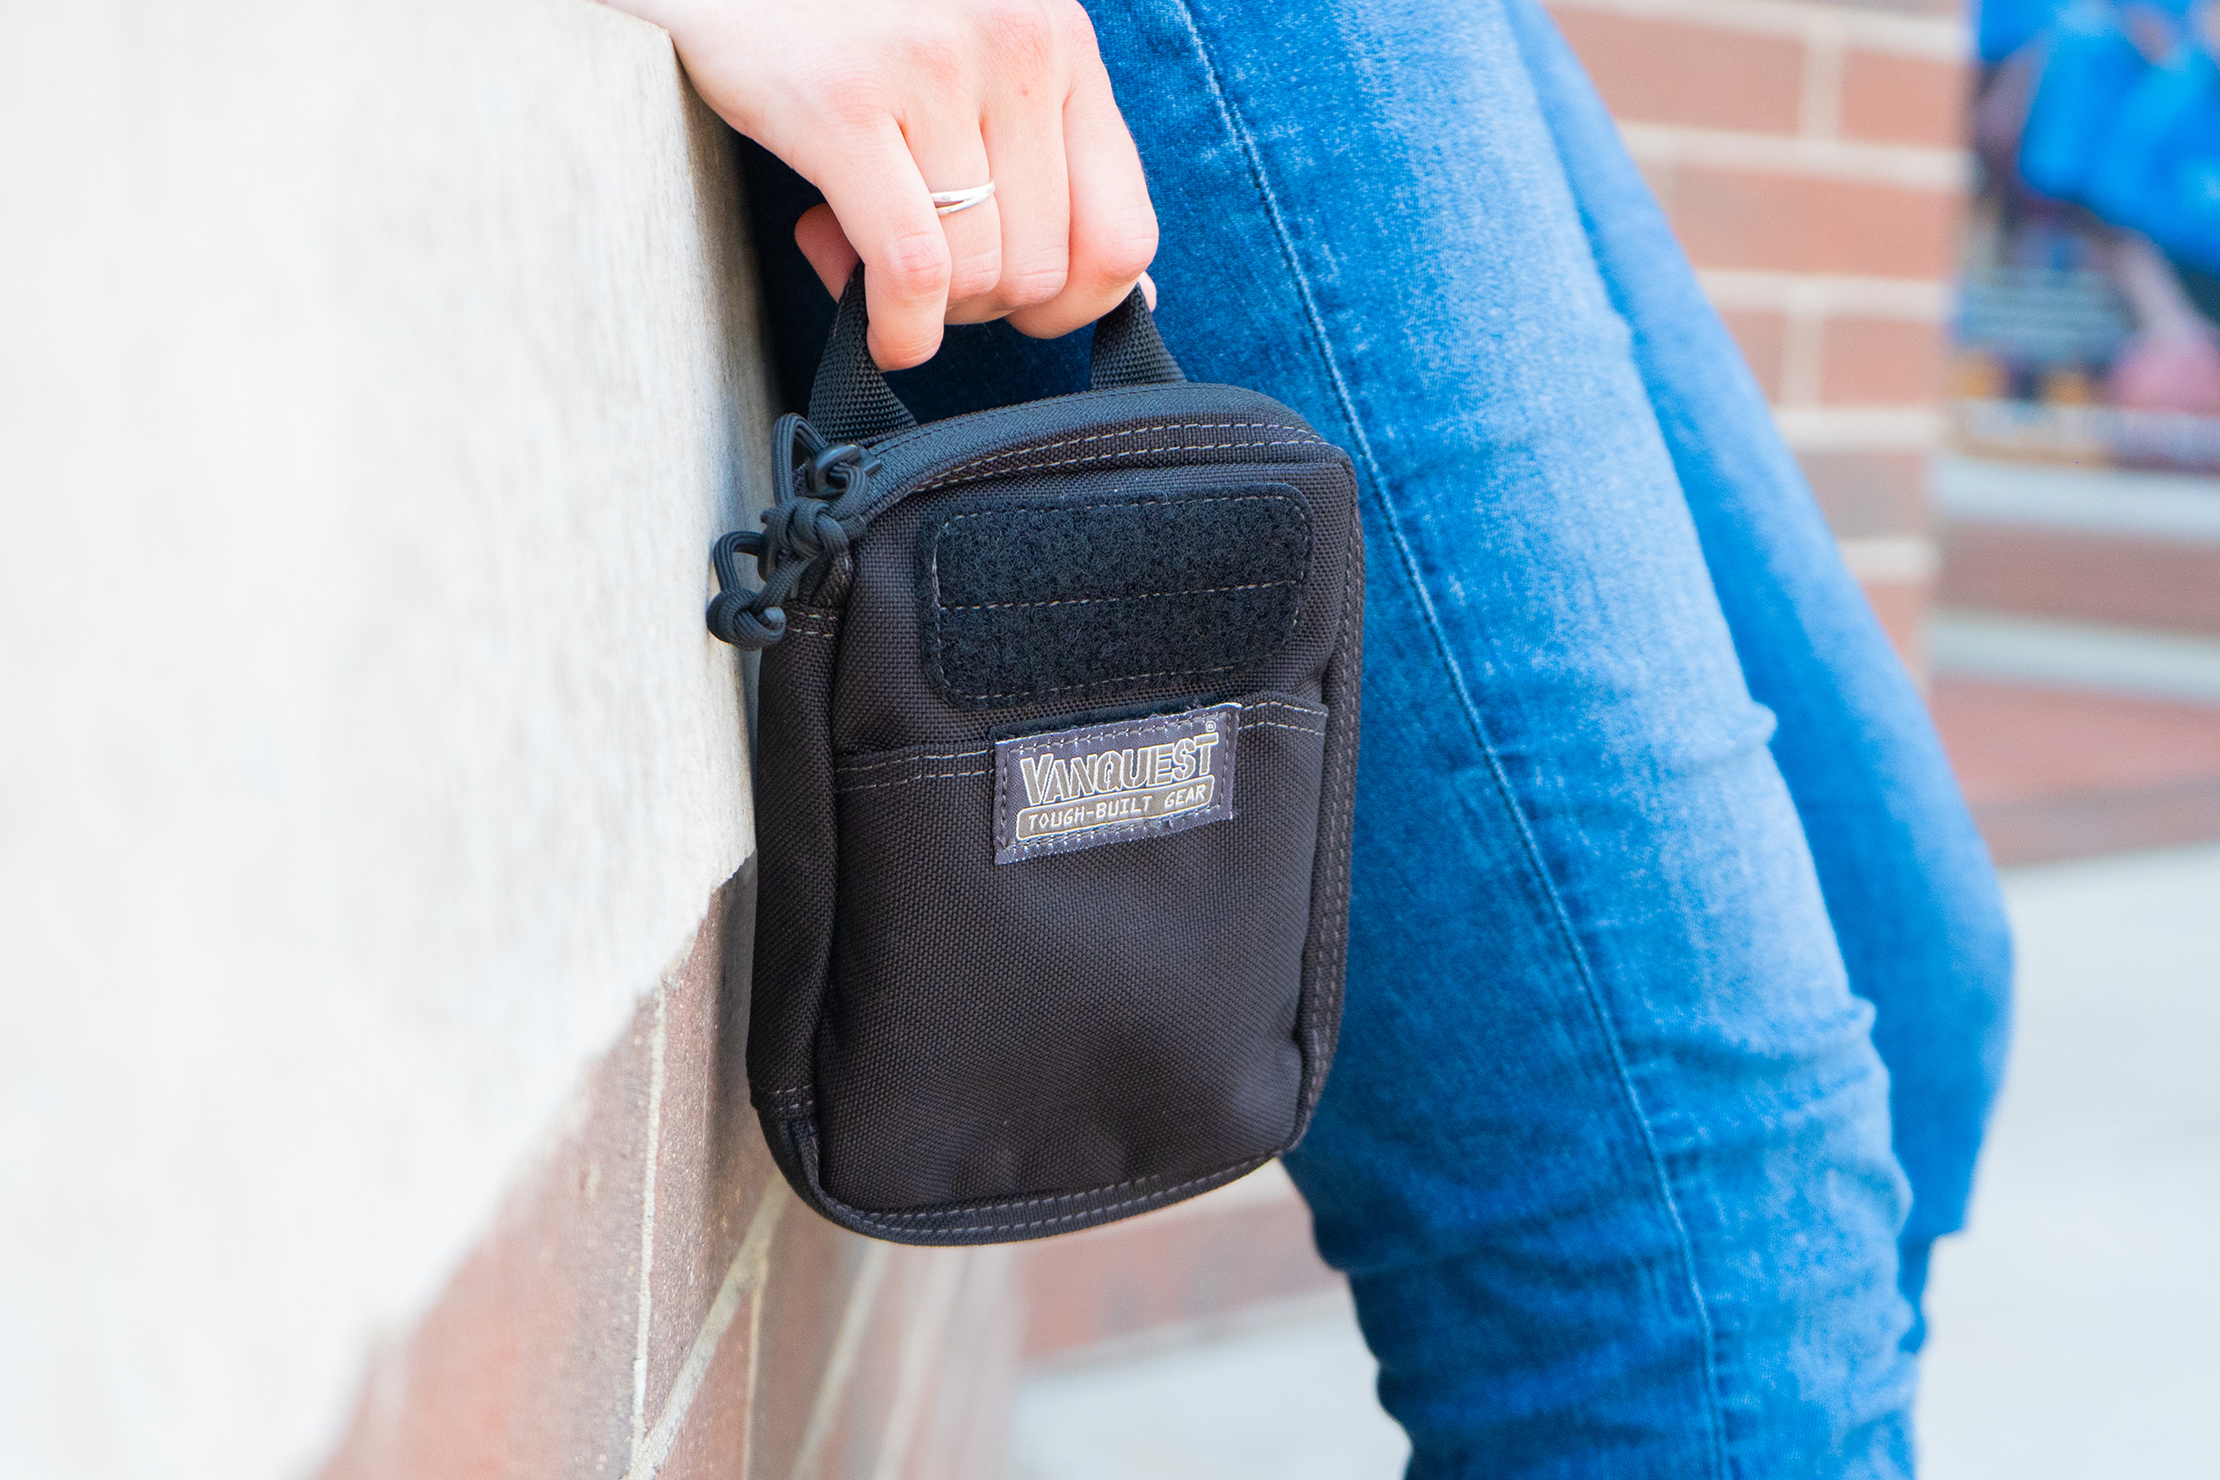 Vanquest PPM-HUSKY 2.0 Carry Handle In Detroit